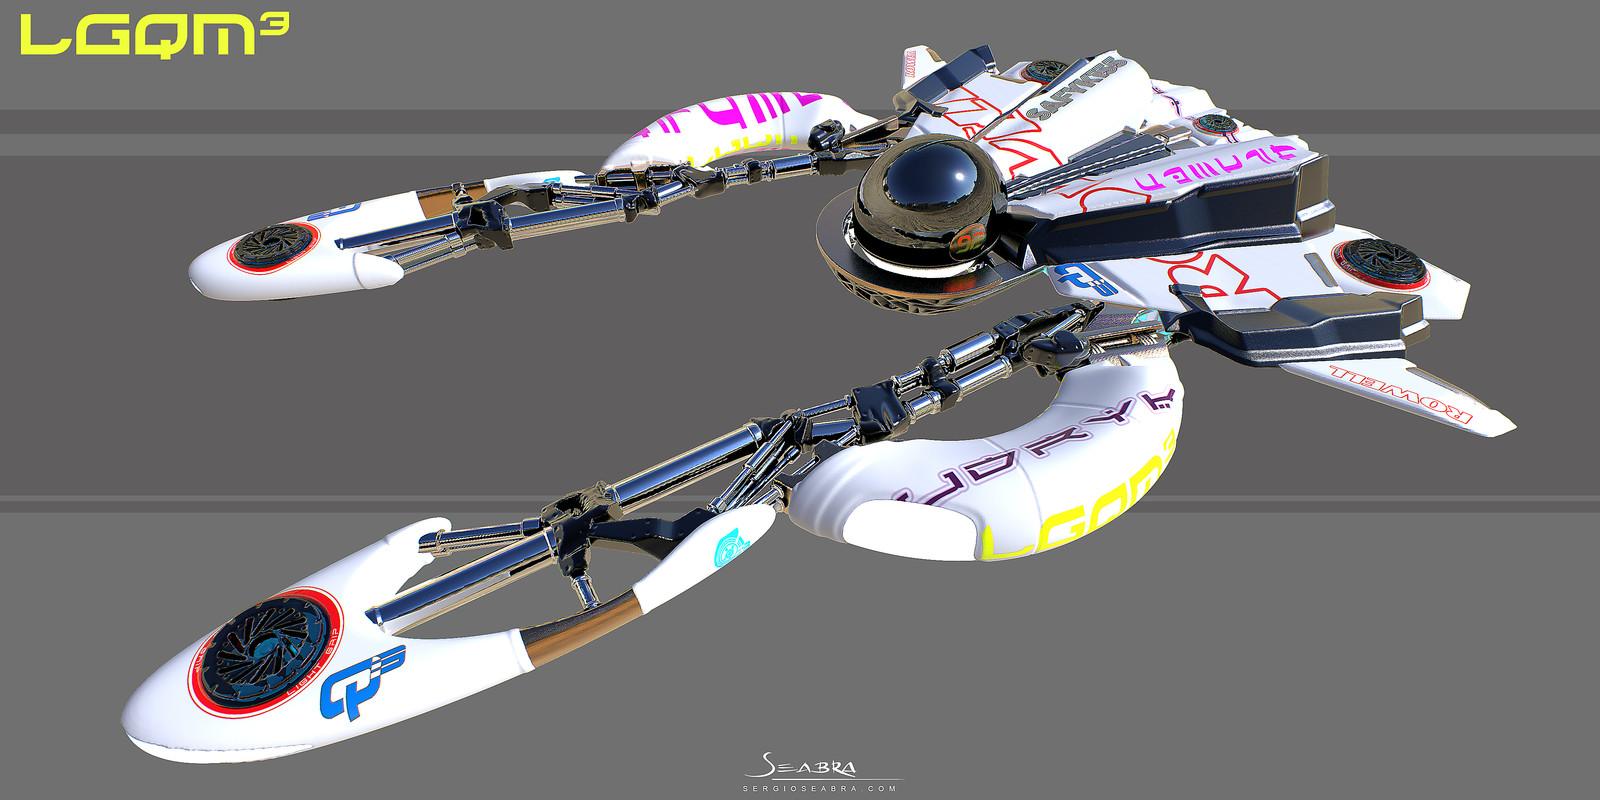 LGqm3 - Light grip racing pod